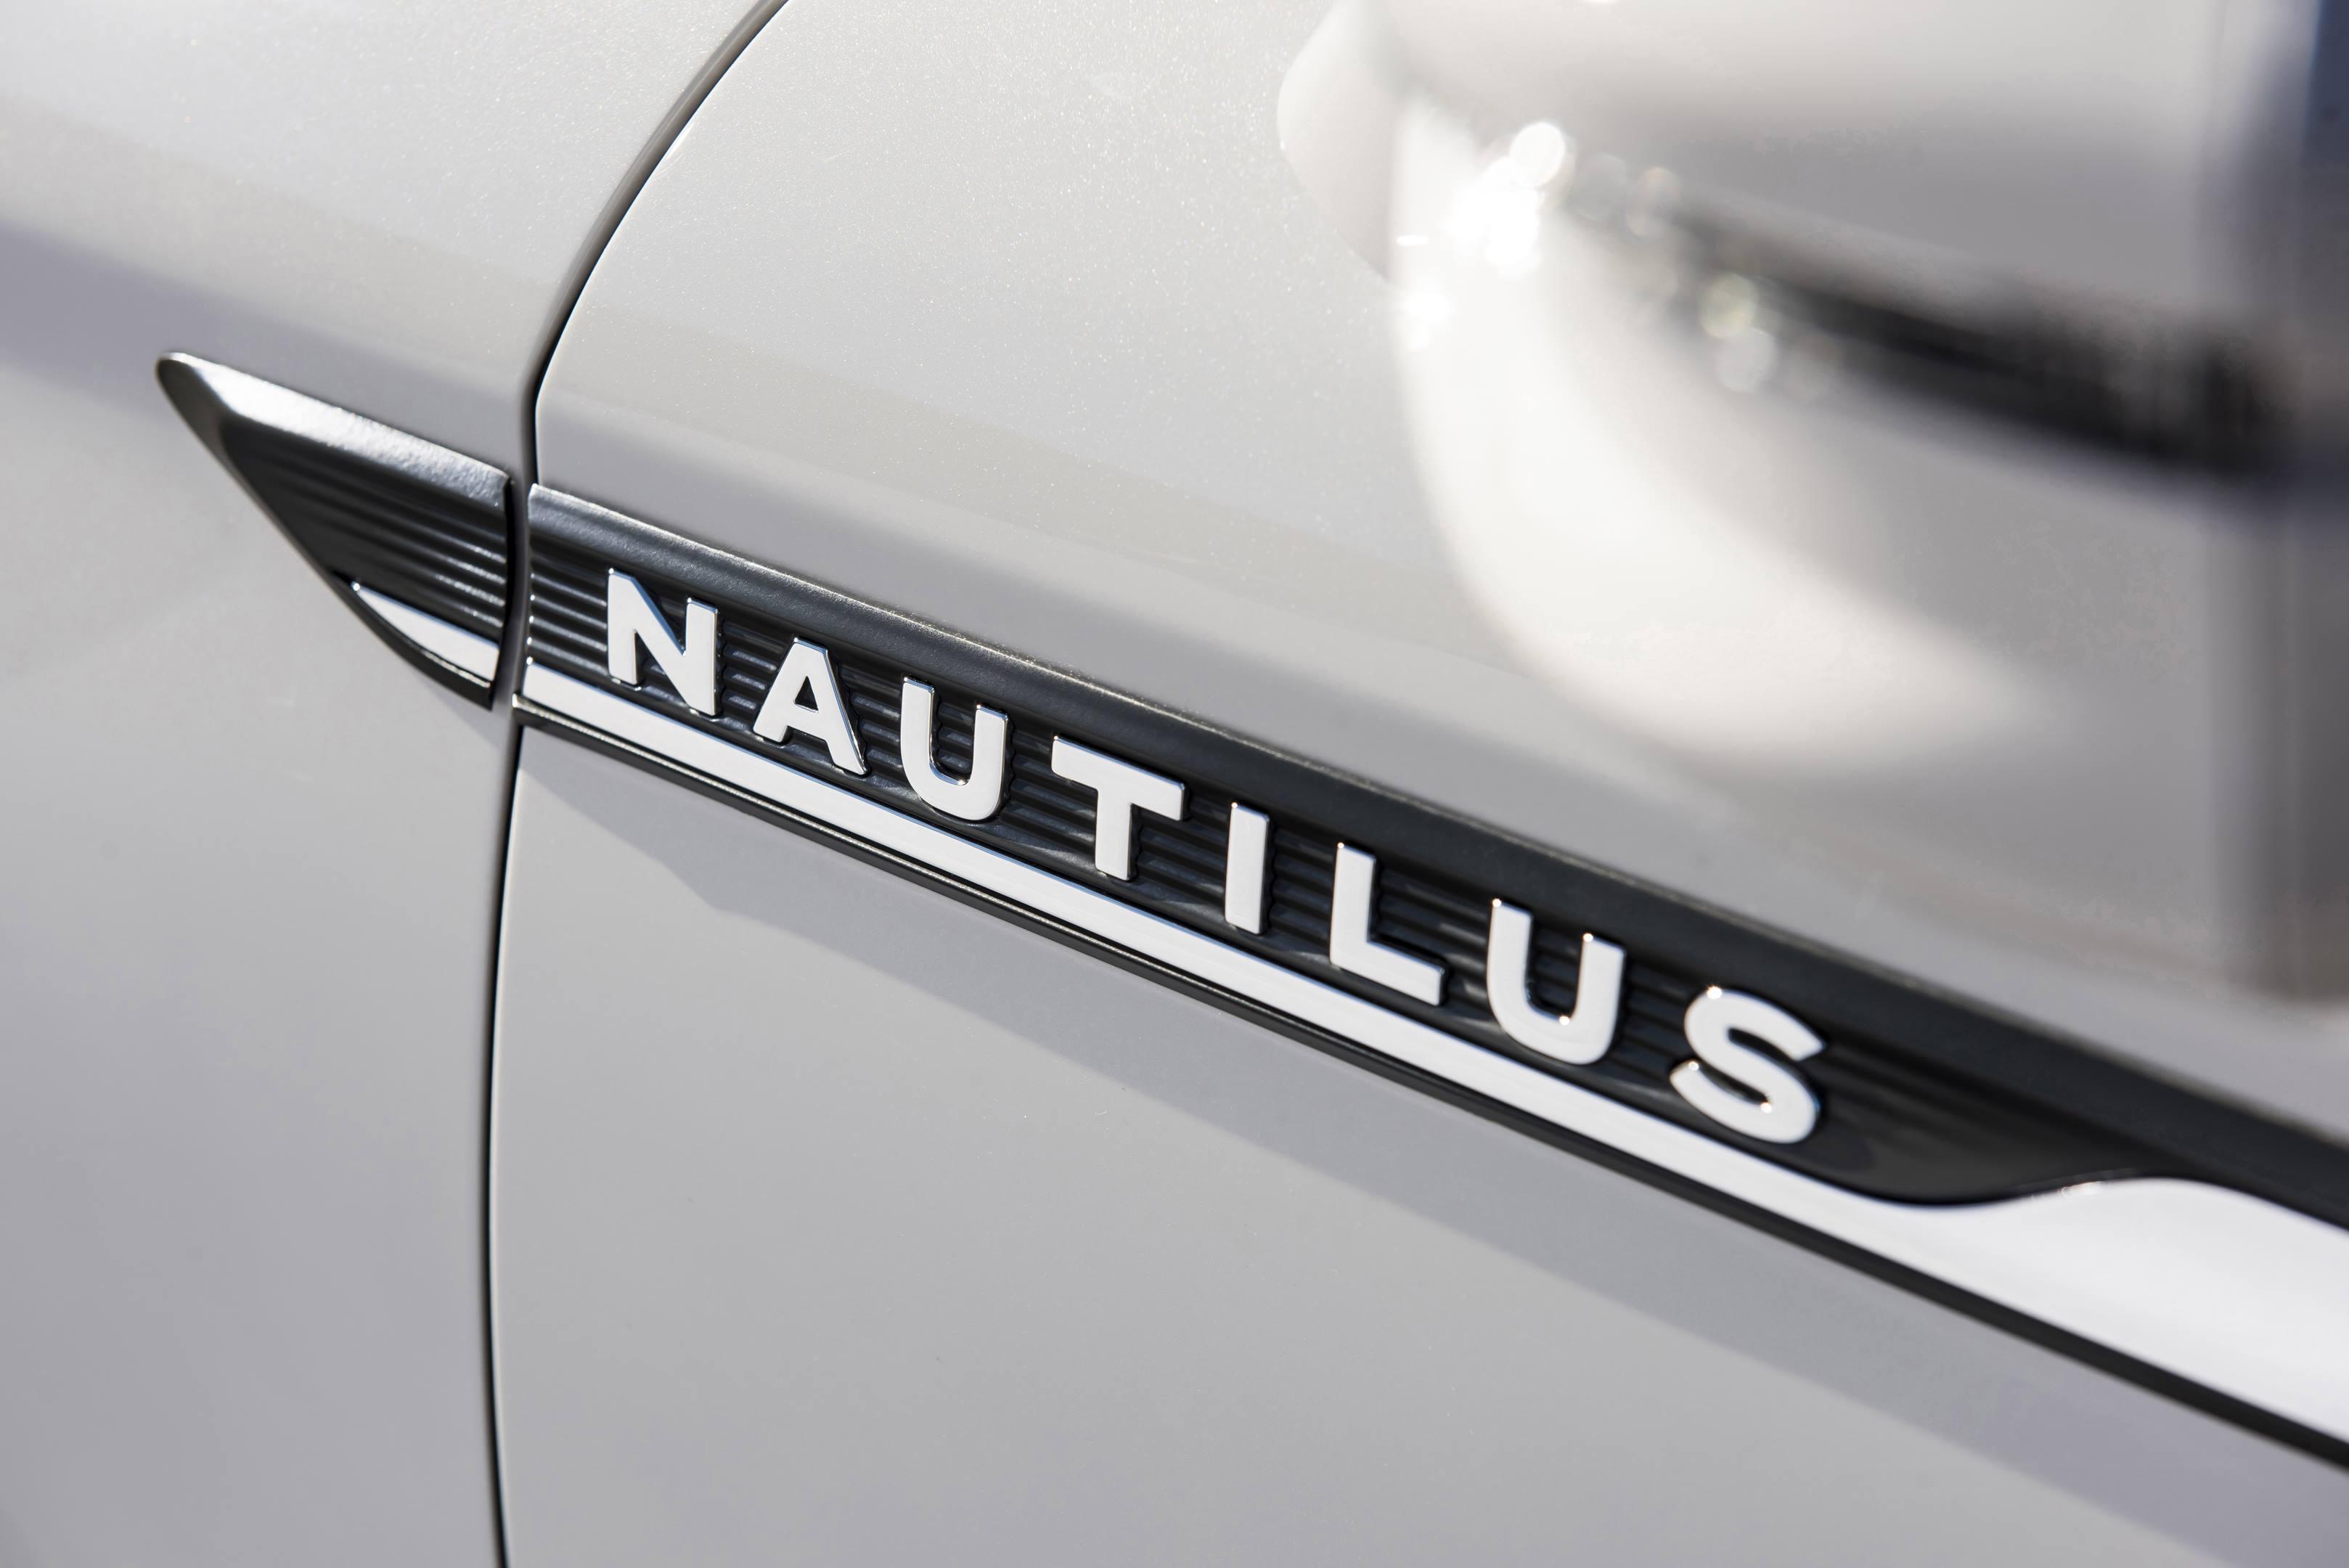 lincoln nautilus name badge